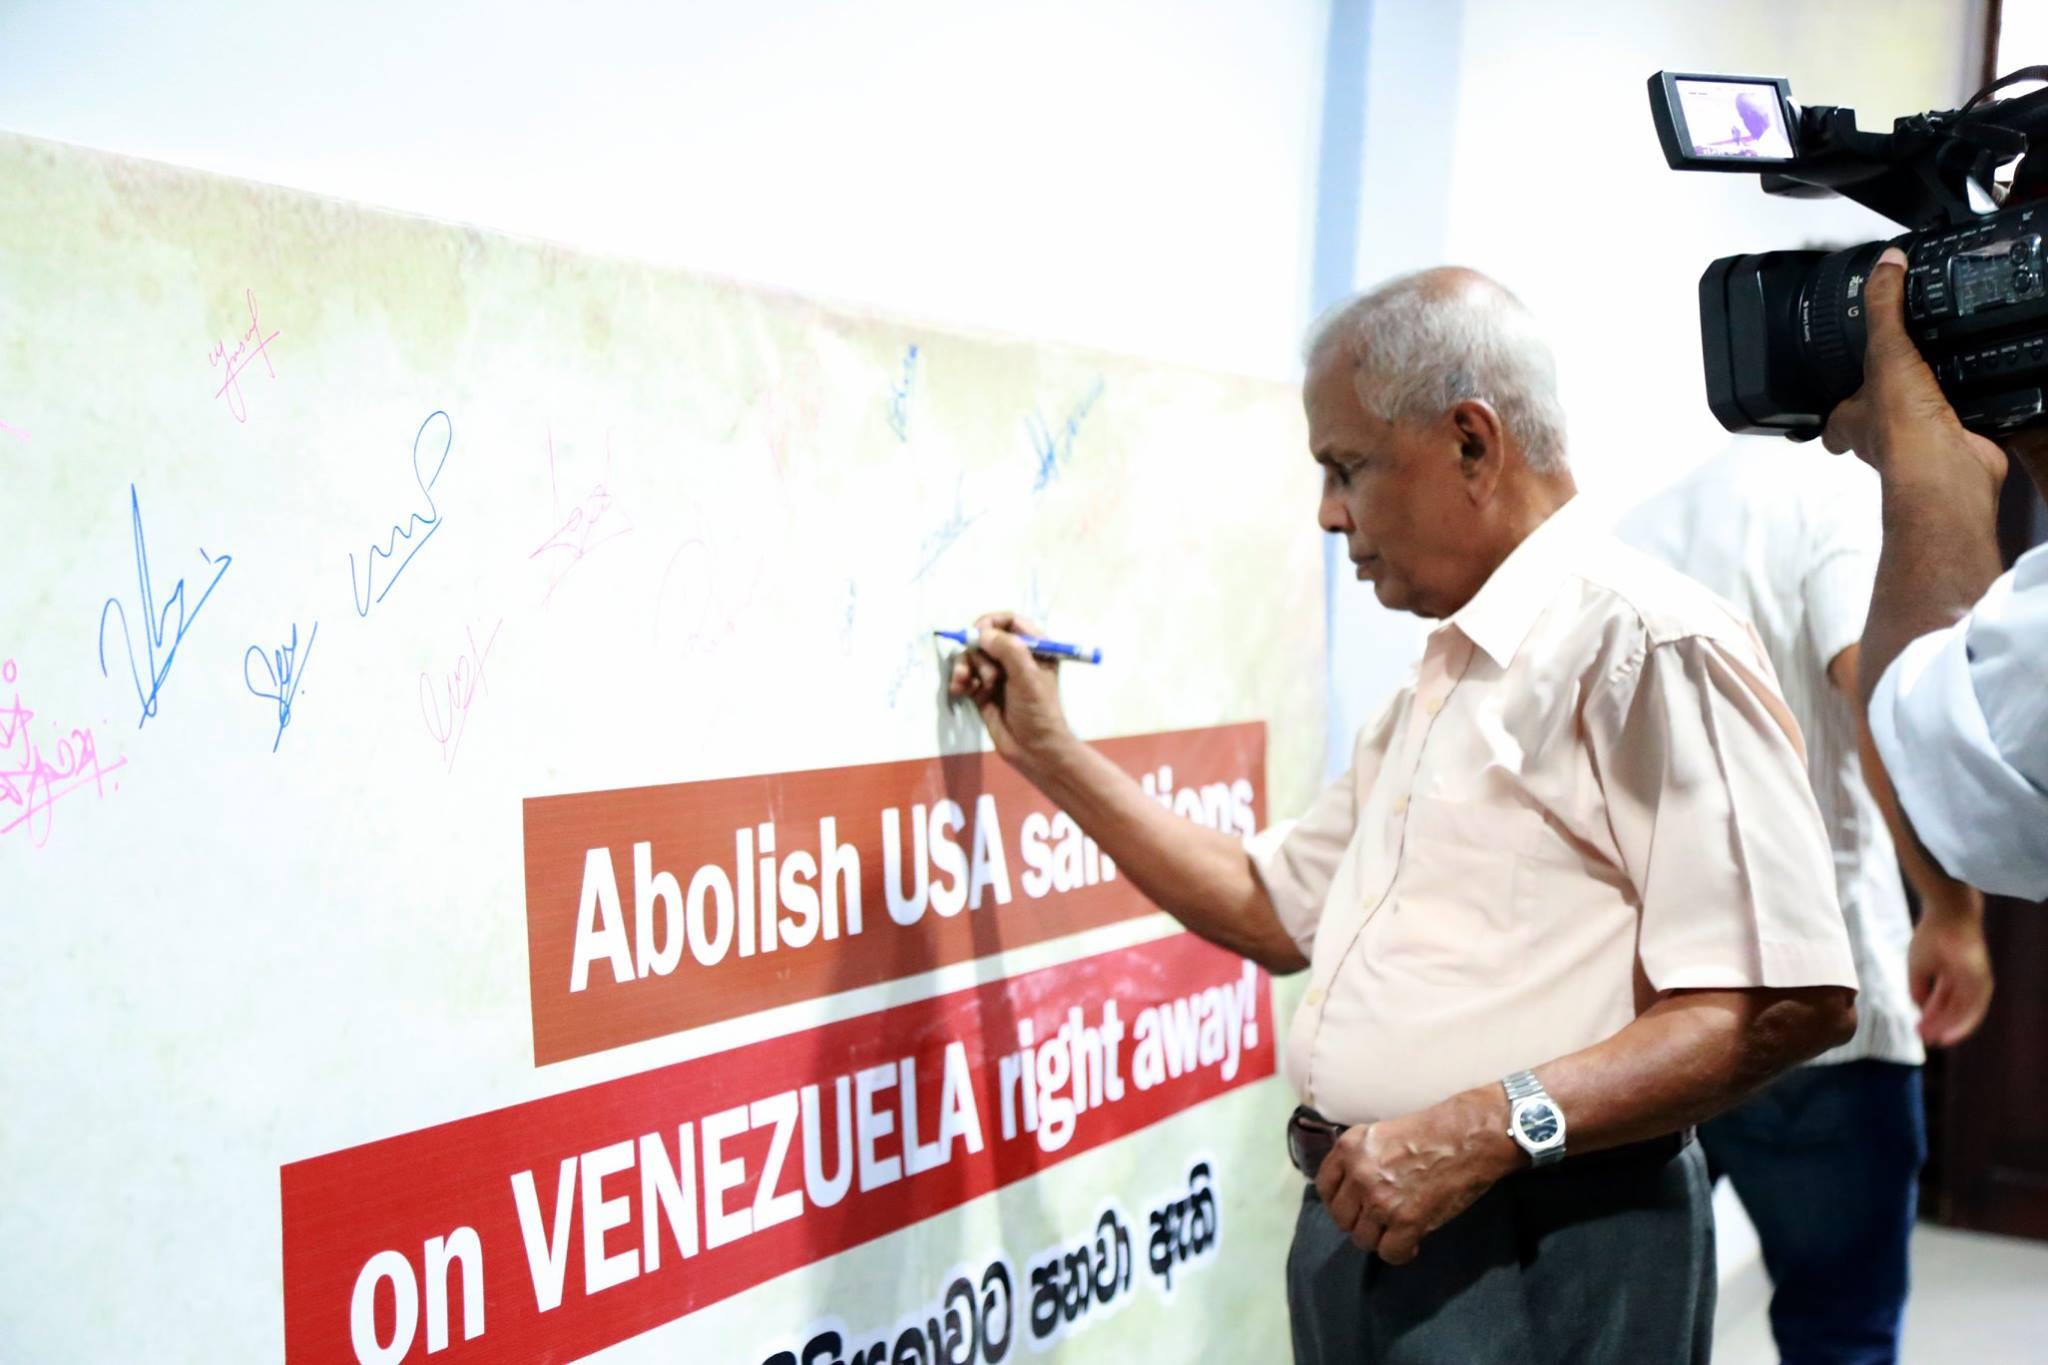 Venezuela-with-Sri-Lanka-2018.05.01-9j